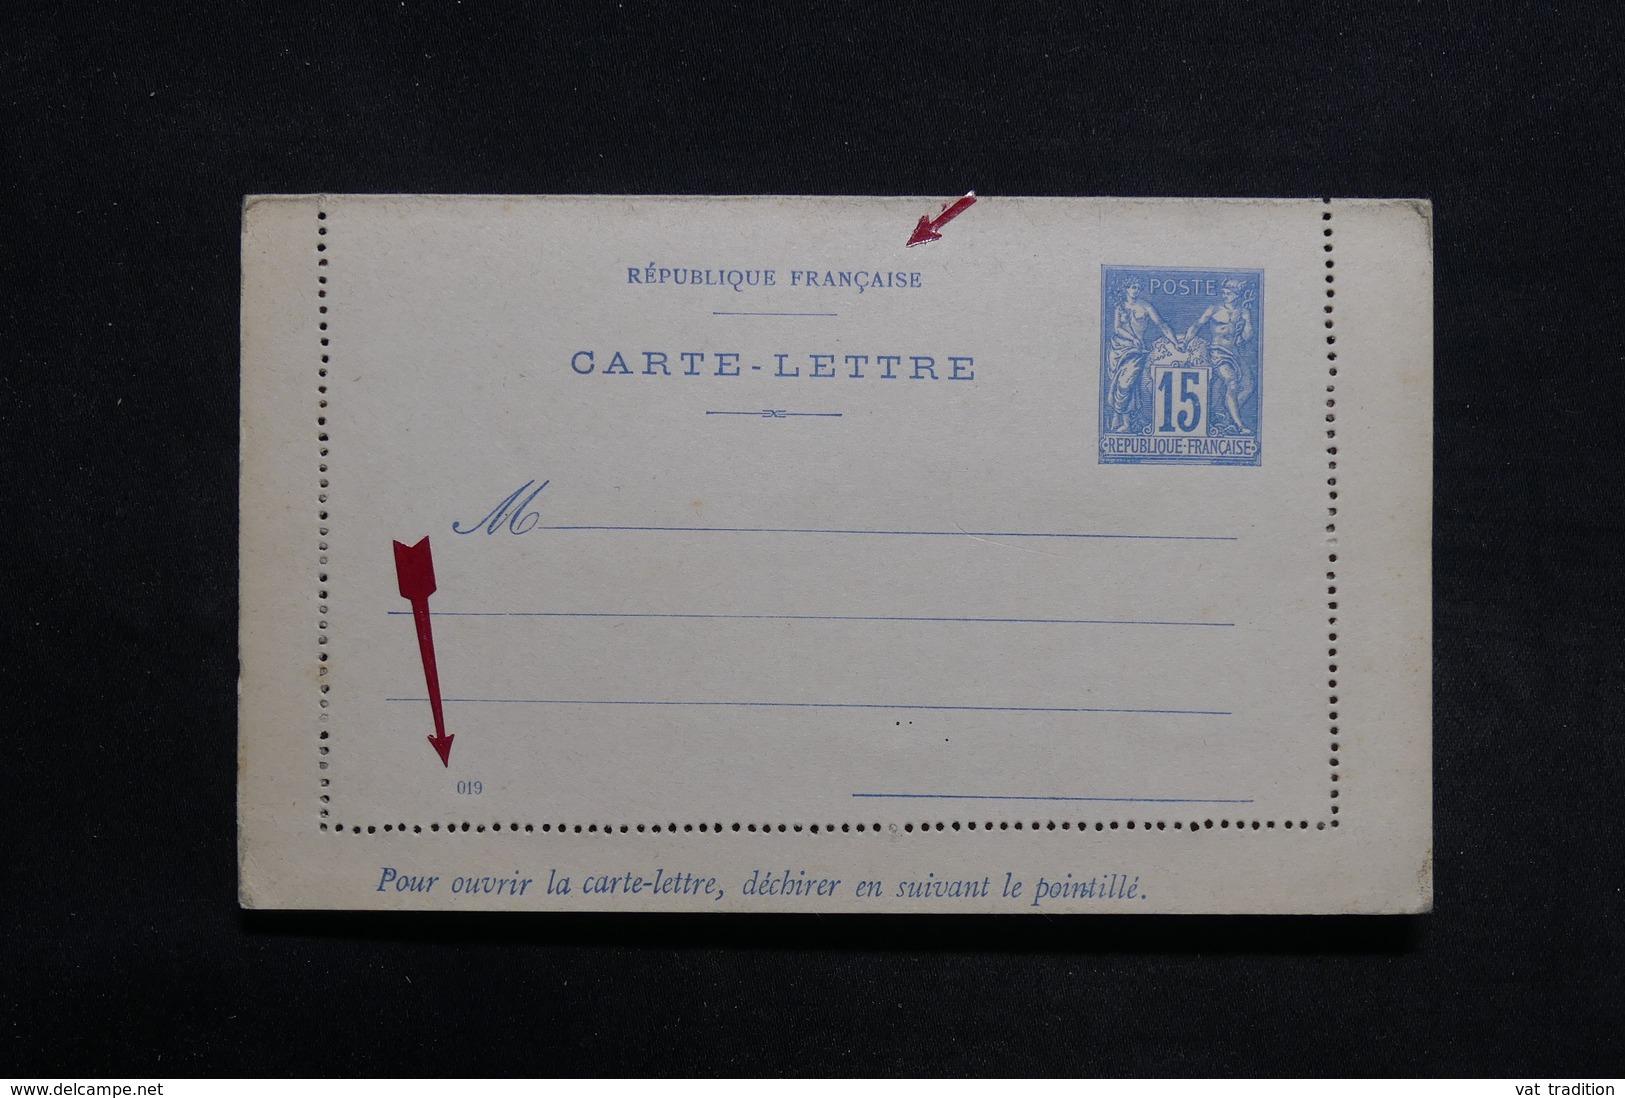 FRANCE - Entier Postal Type Sage Non Circulé - L 31454 - Postal Stamped Stationery